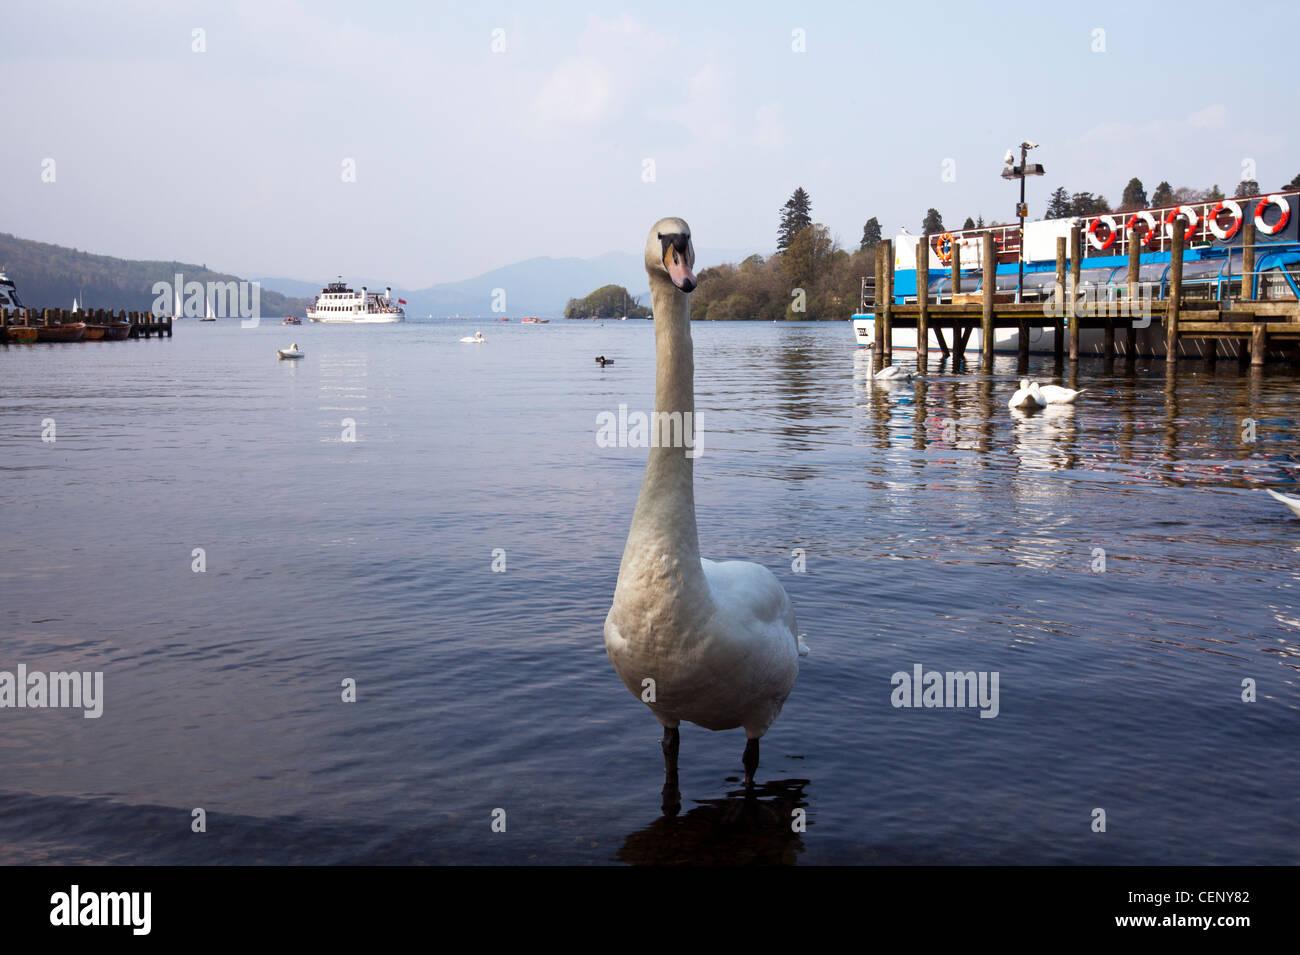 Detail of white swan at lake windermere, Cumbria - Stock Image